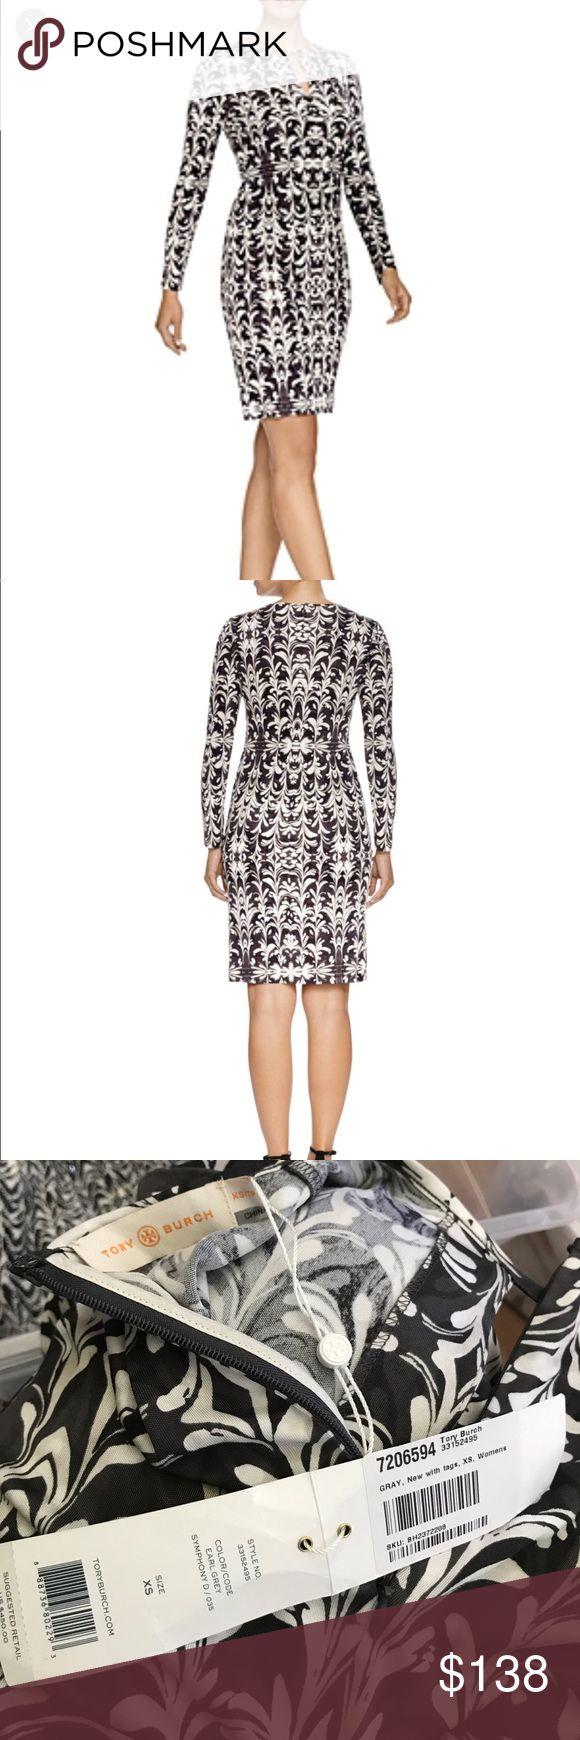 "NWT Tory Burch brushstroke print silk dress New with tag bust34-35""length 40 Tory Burch Dresses"